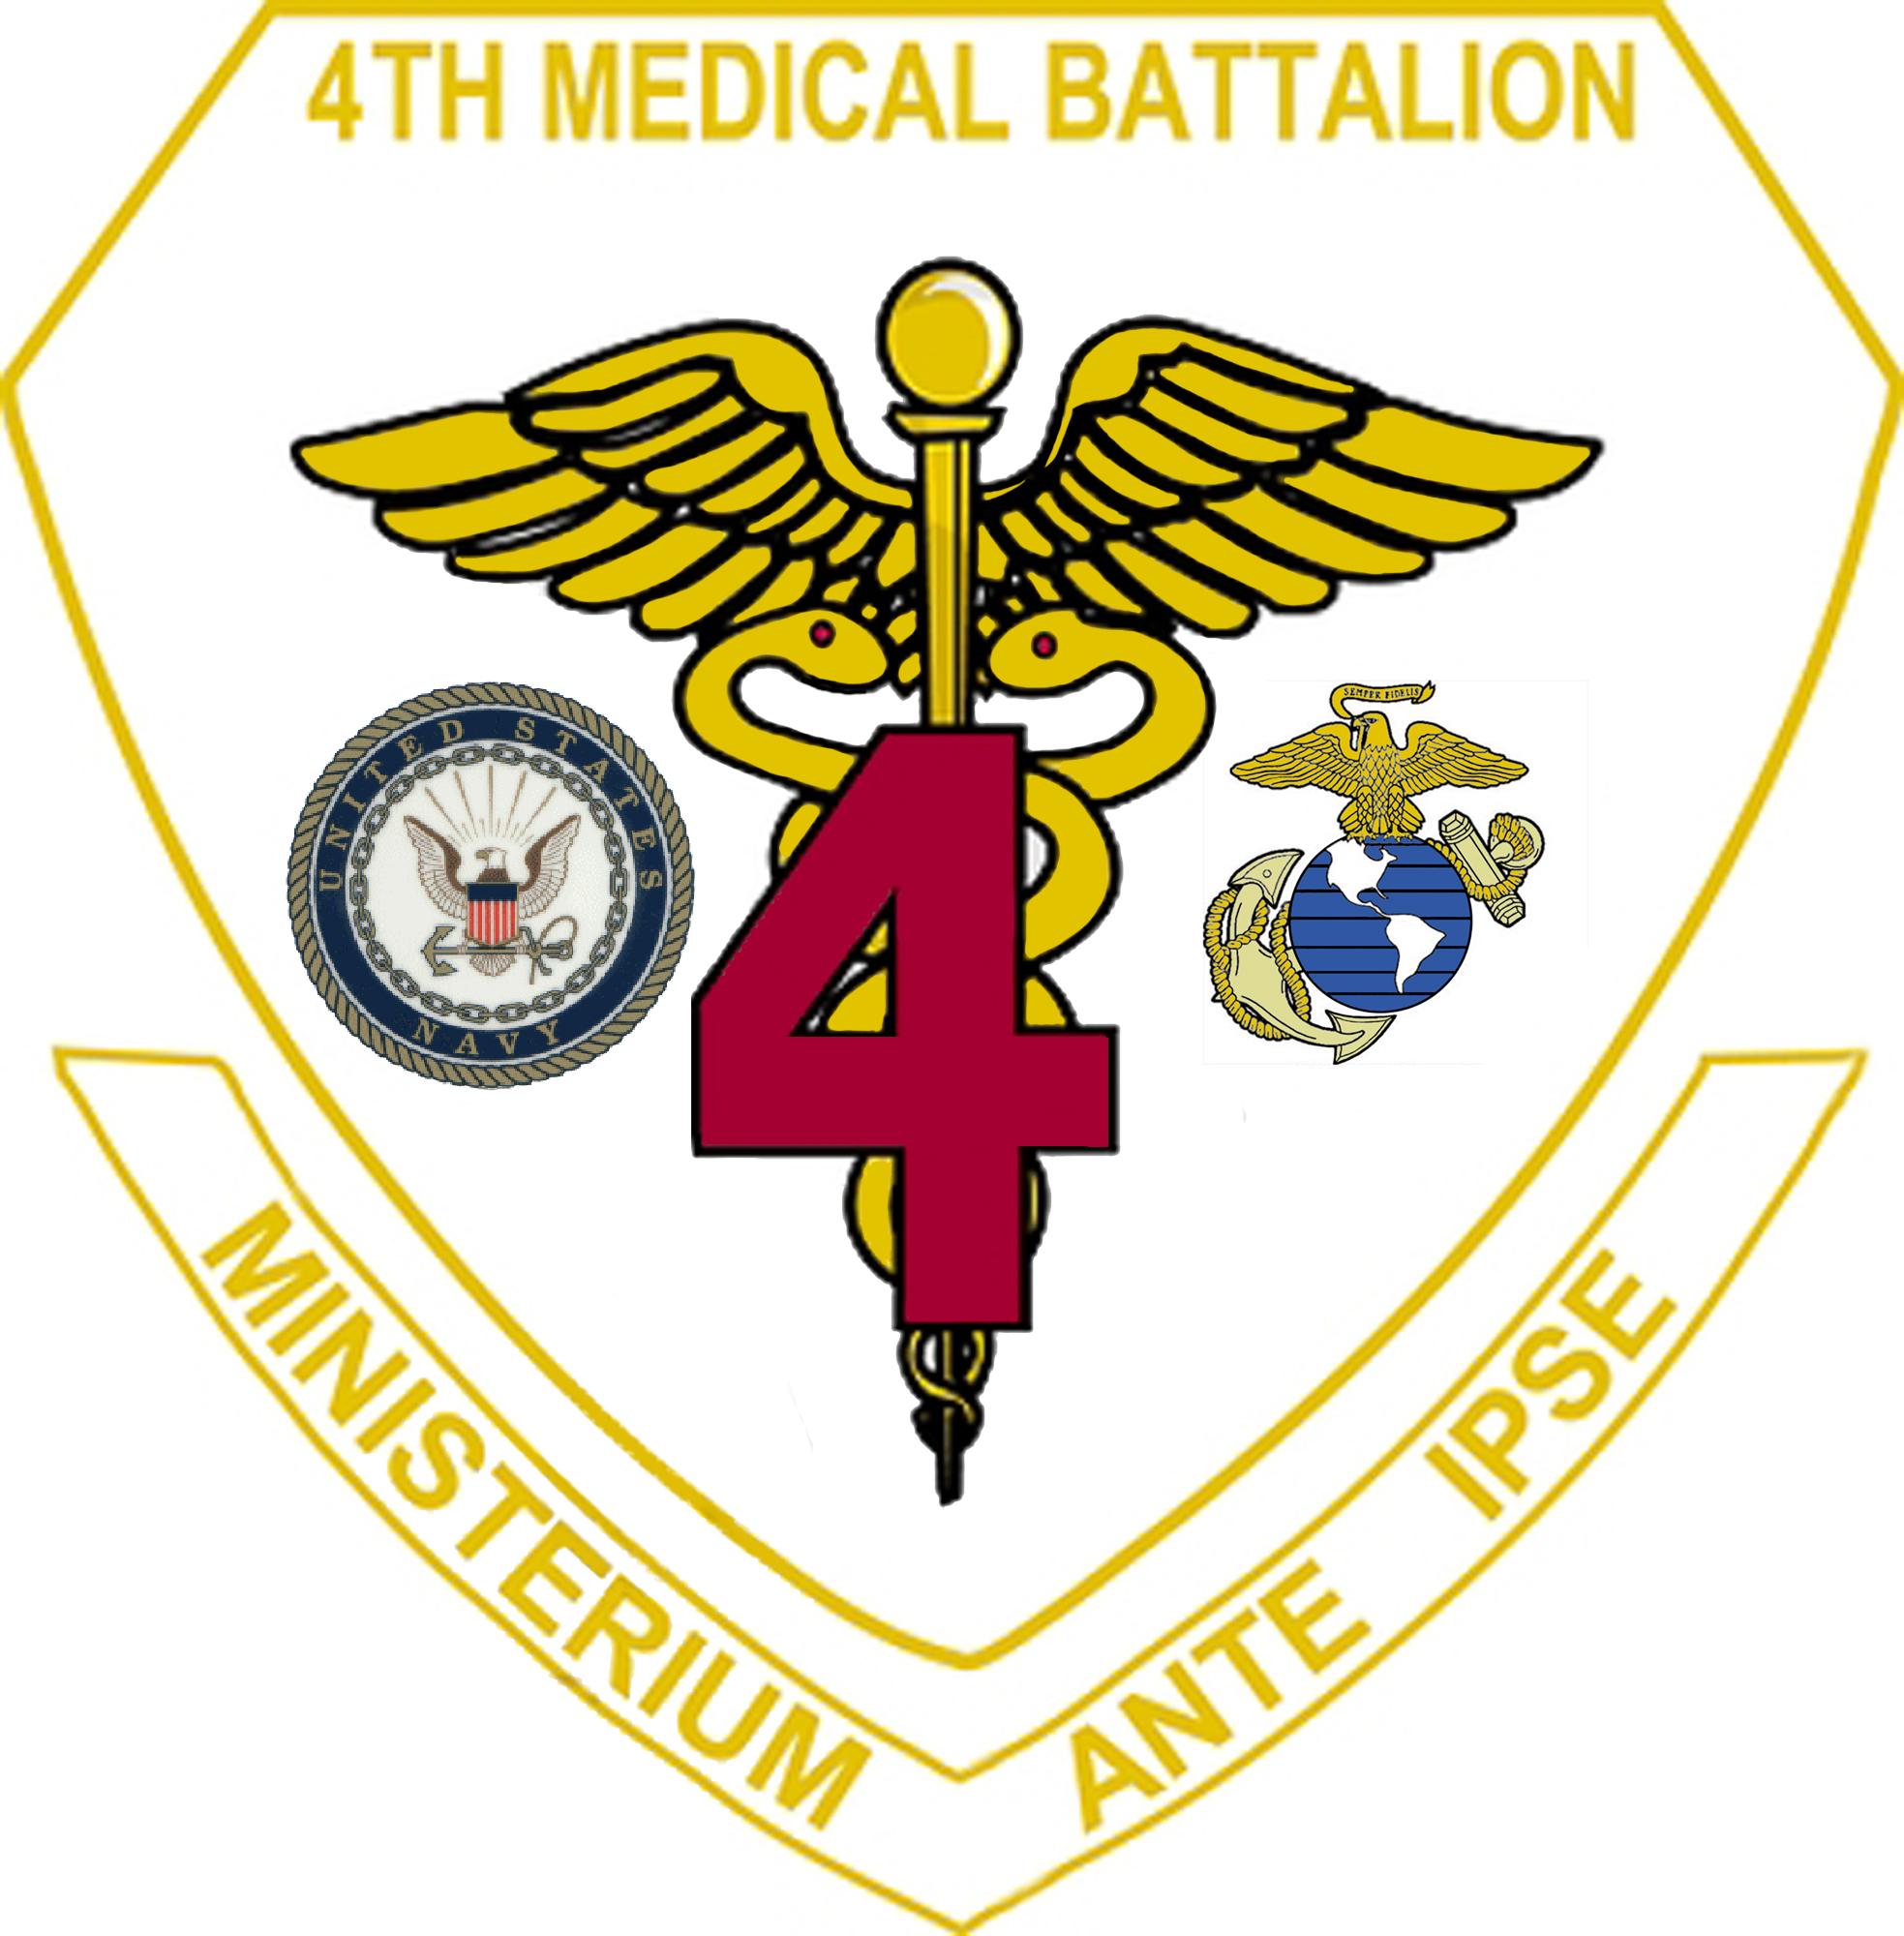 4th Medical Battalion (United States Marine Corps) - Wikipedia